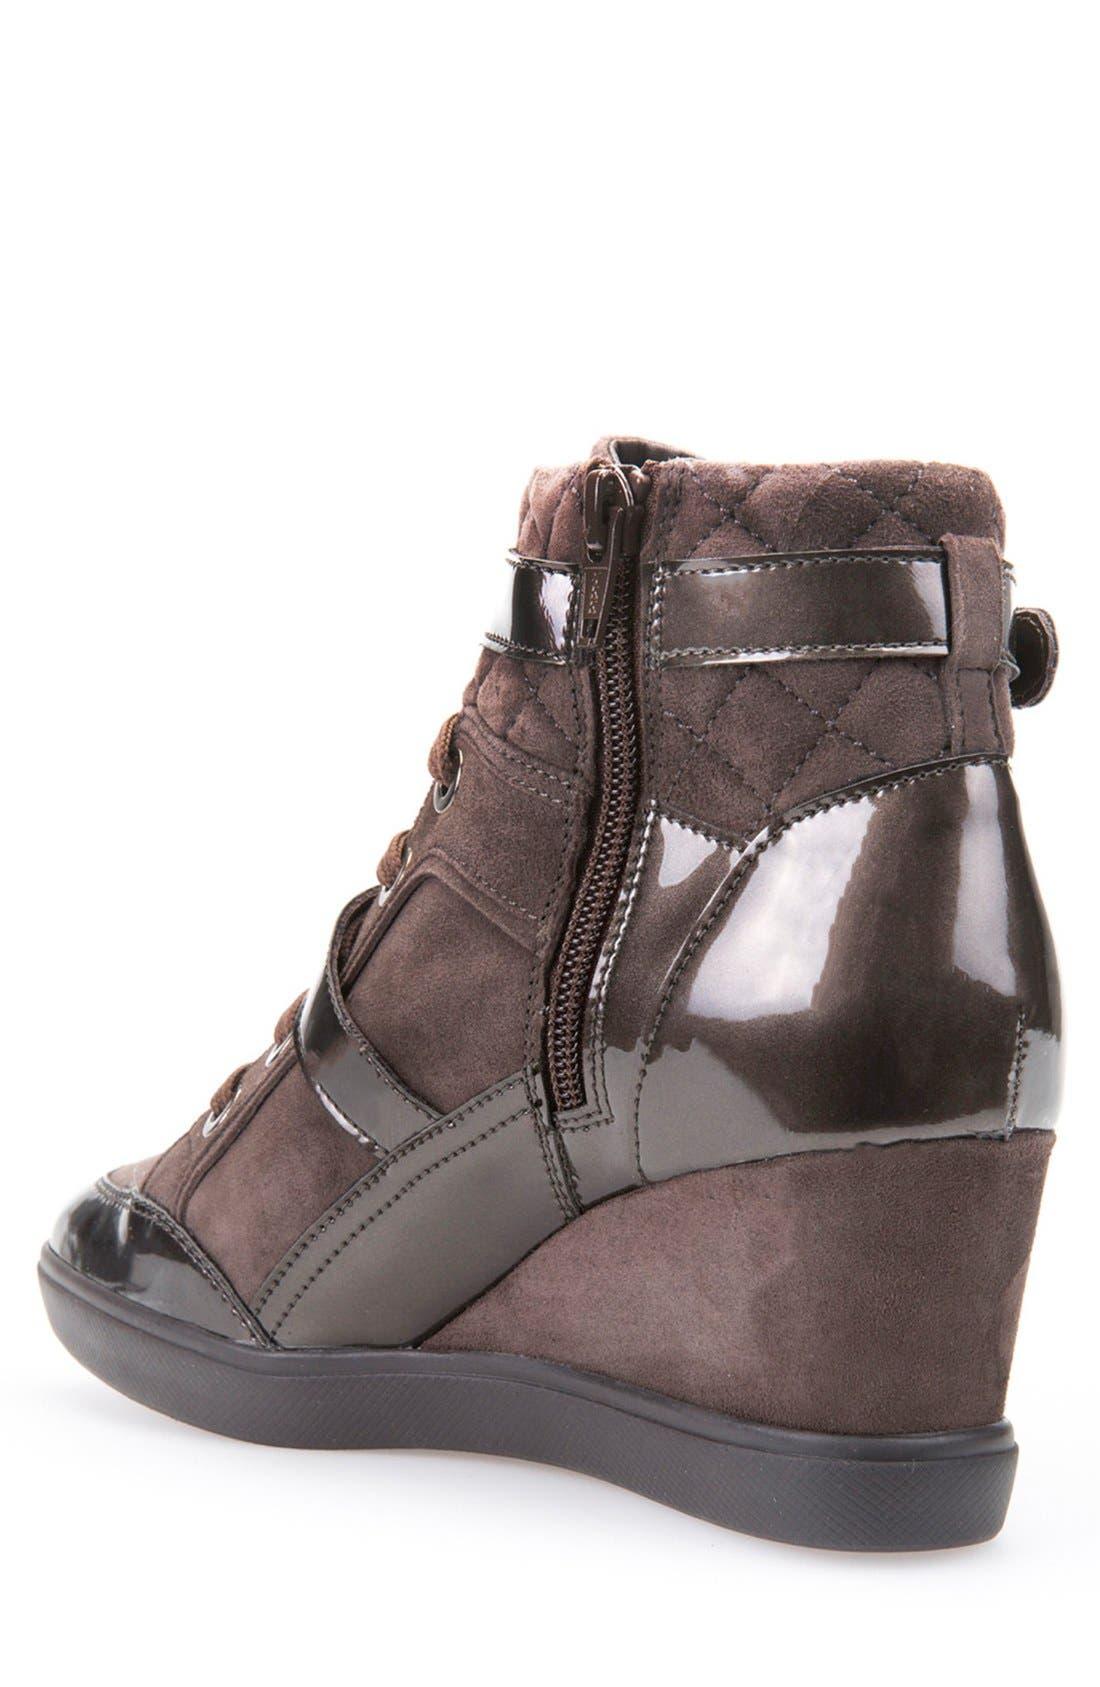 'Eleni' Wedge Sneaker,                             Alternate thumbnail 2, color,                             Chestnut Suede